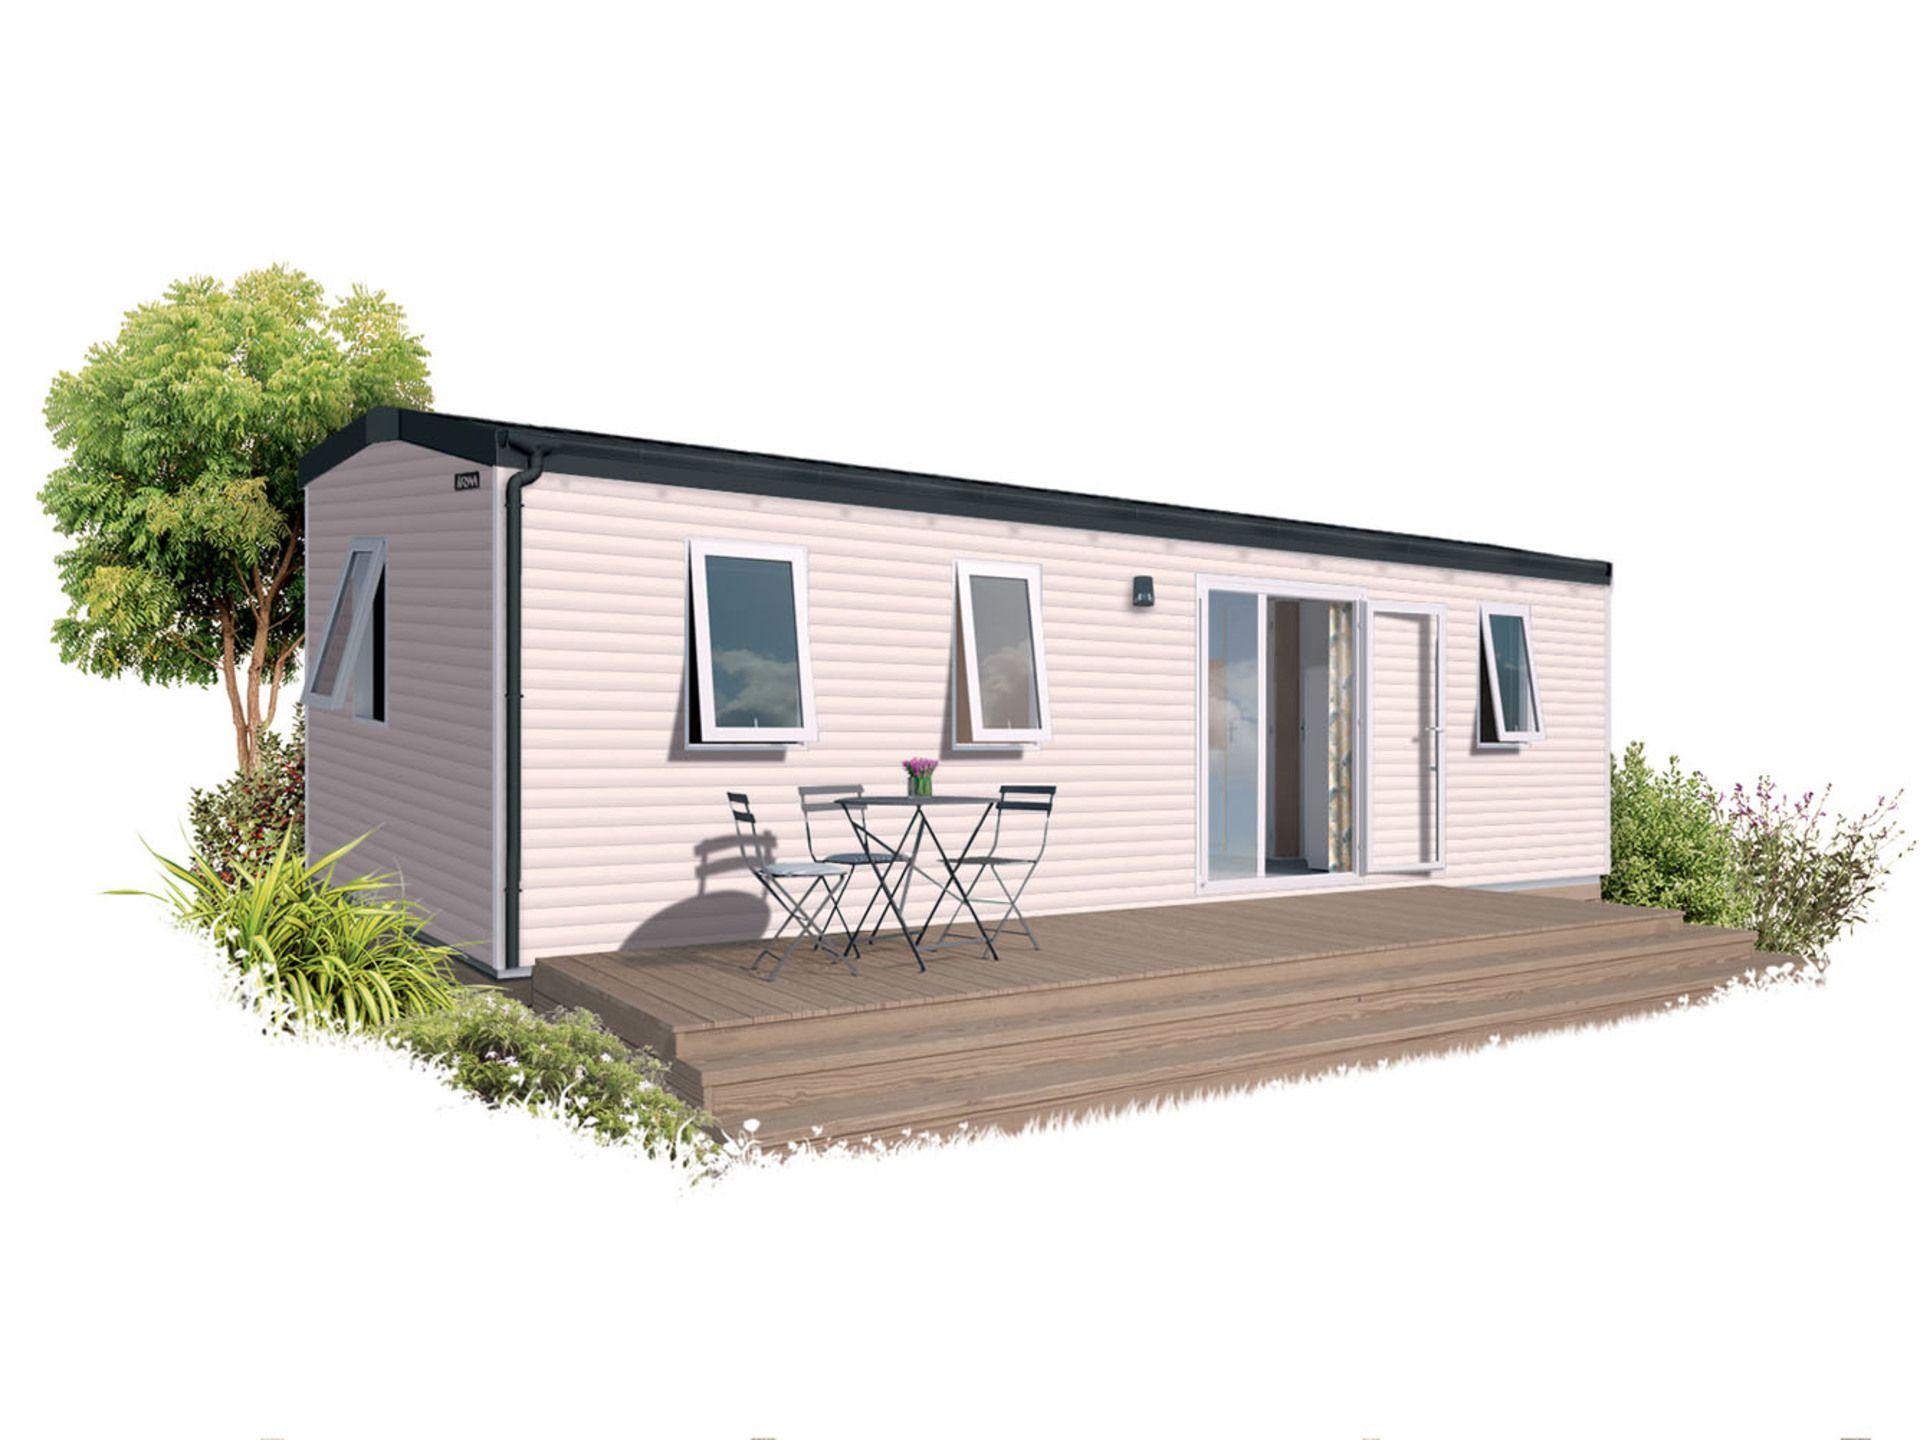 IRM SUPER CORDELIA - 2022 - Mobil home Neuf -Zen Mobil homes